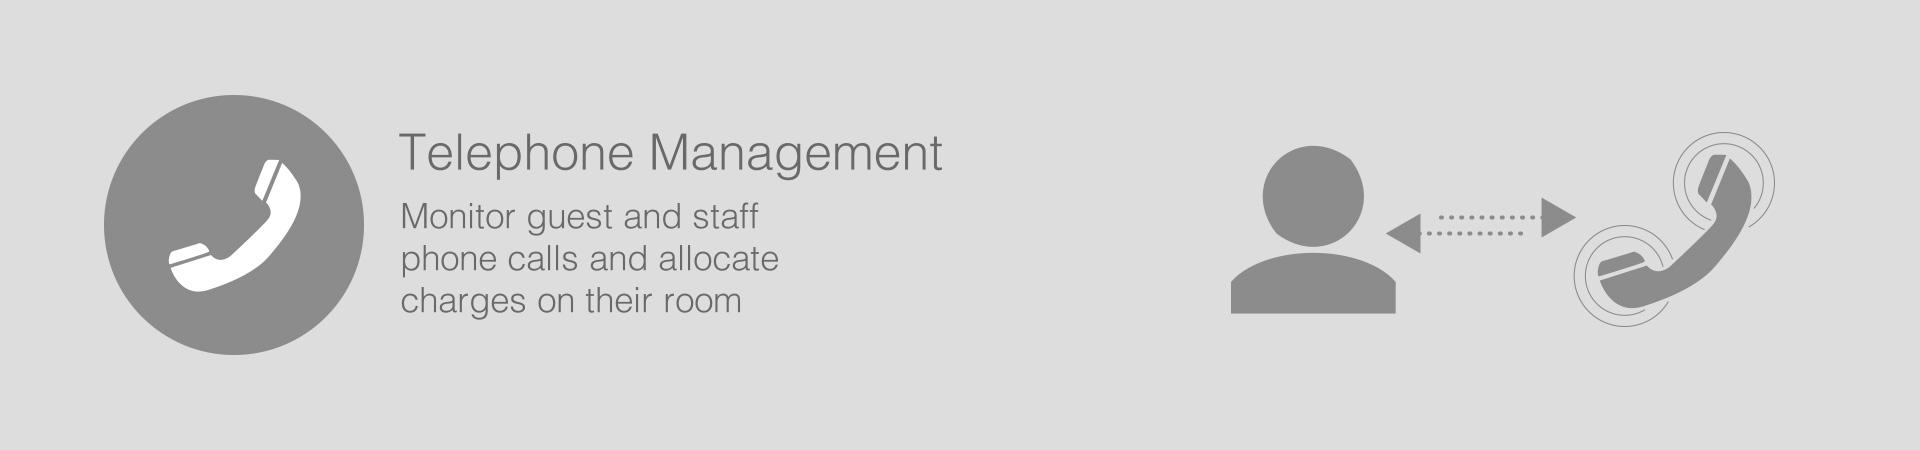 Telephone Management header